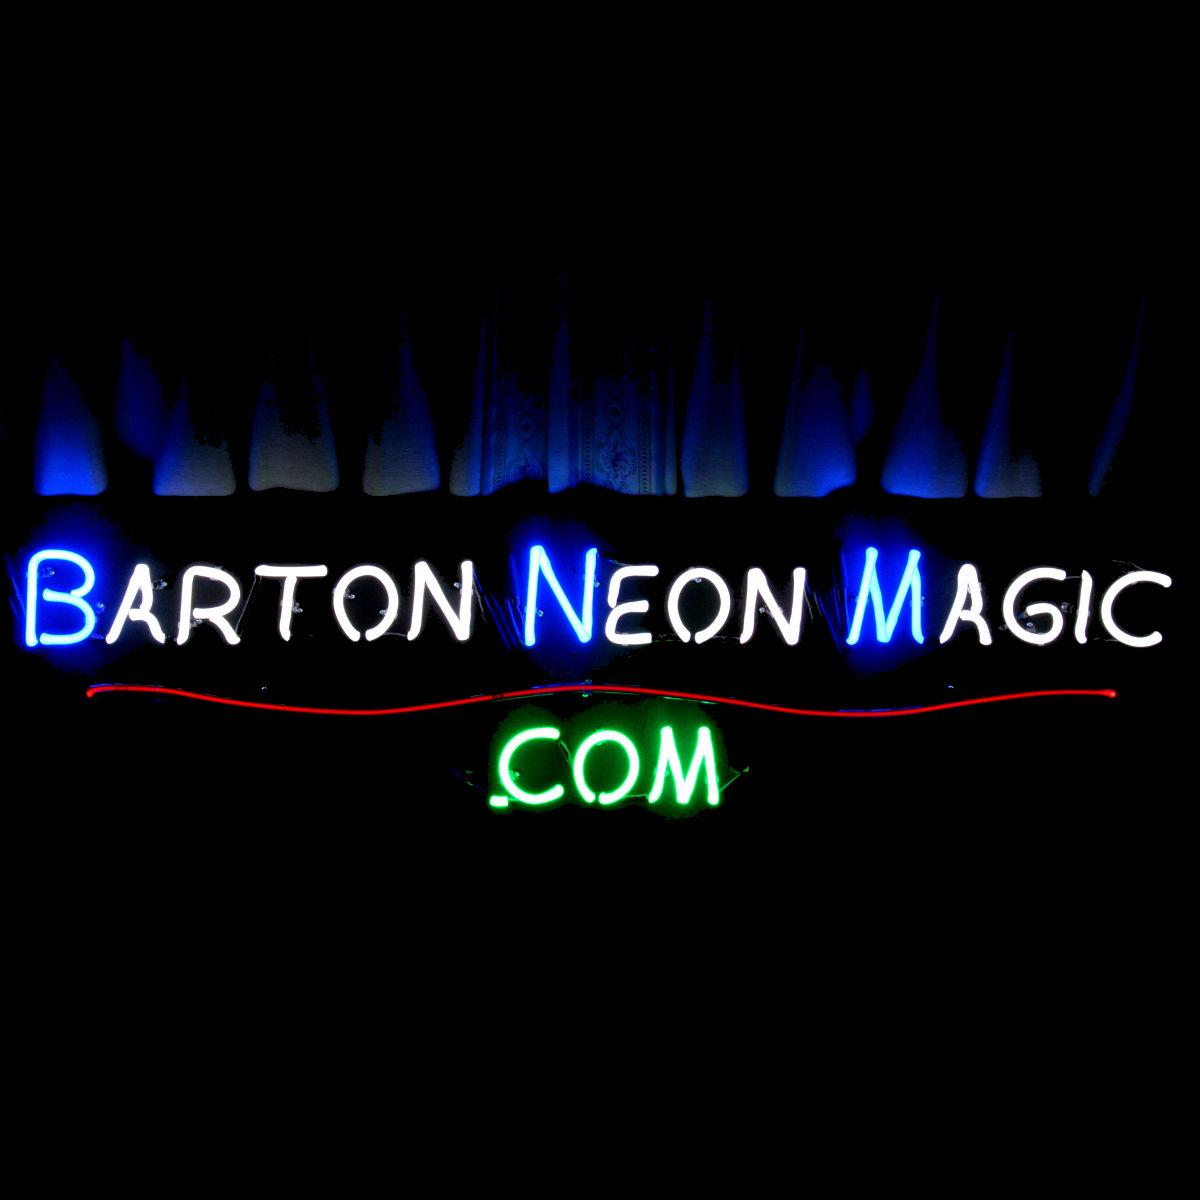 Fine Quality Custom Designer Neon LIght Fixtures by John Barton - BartonNeonMagic.com